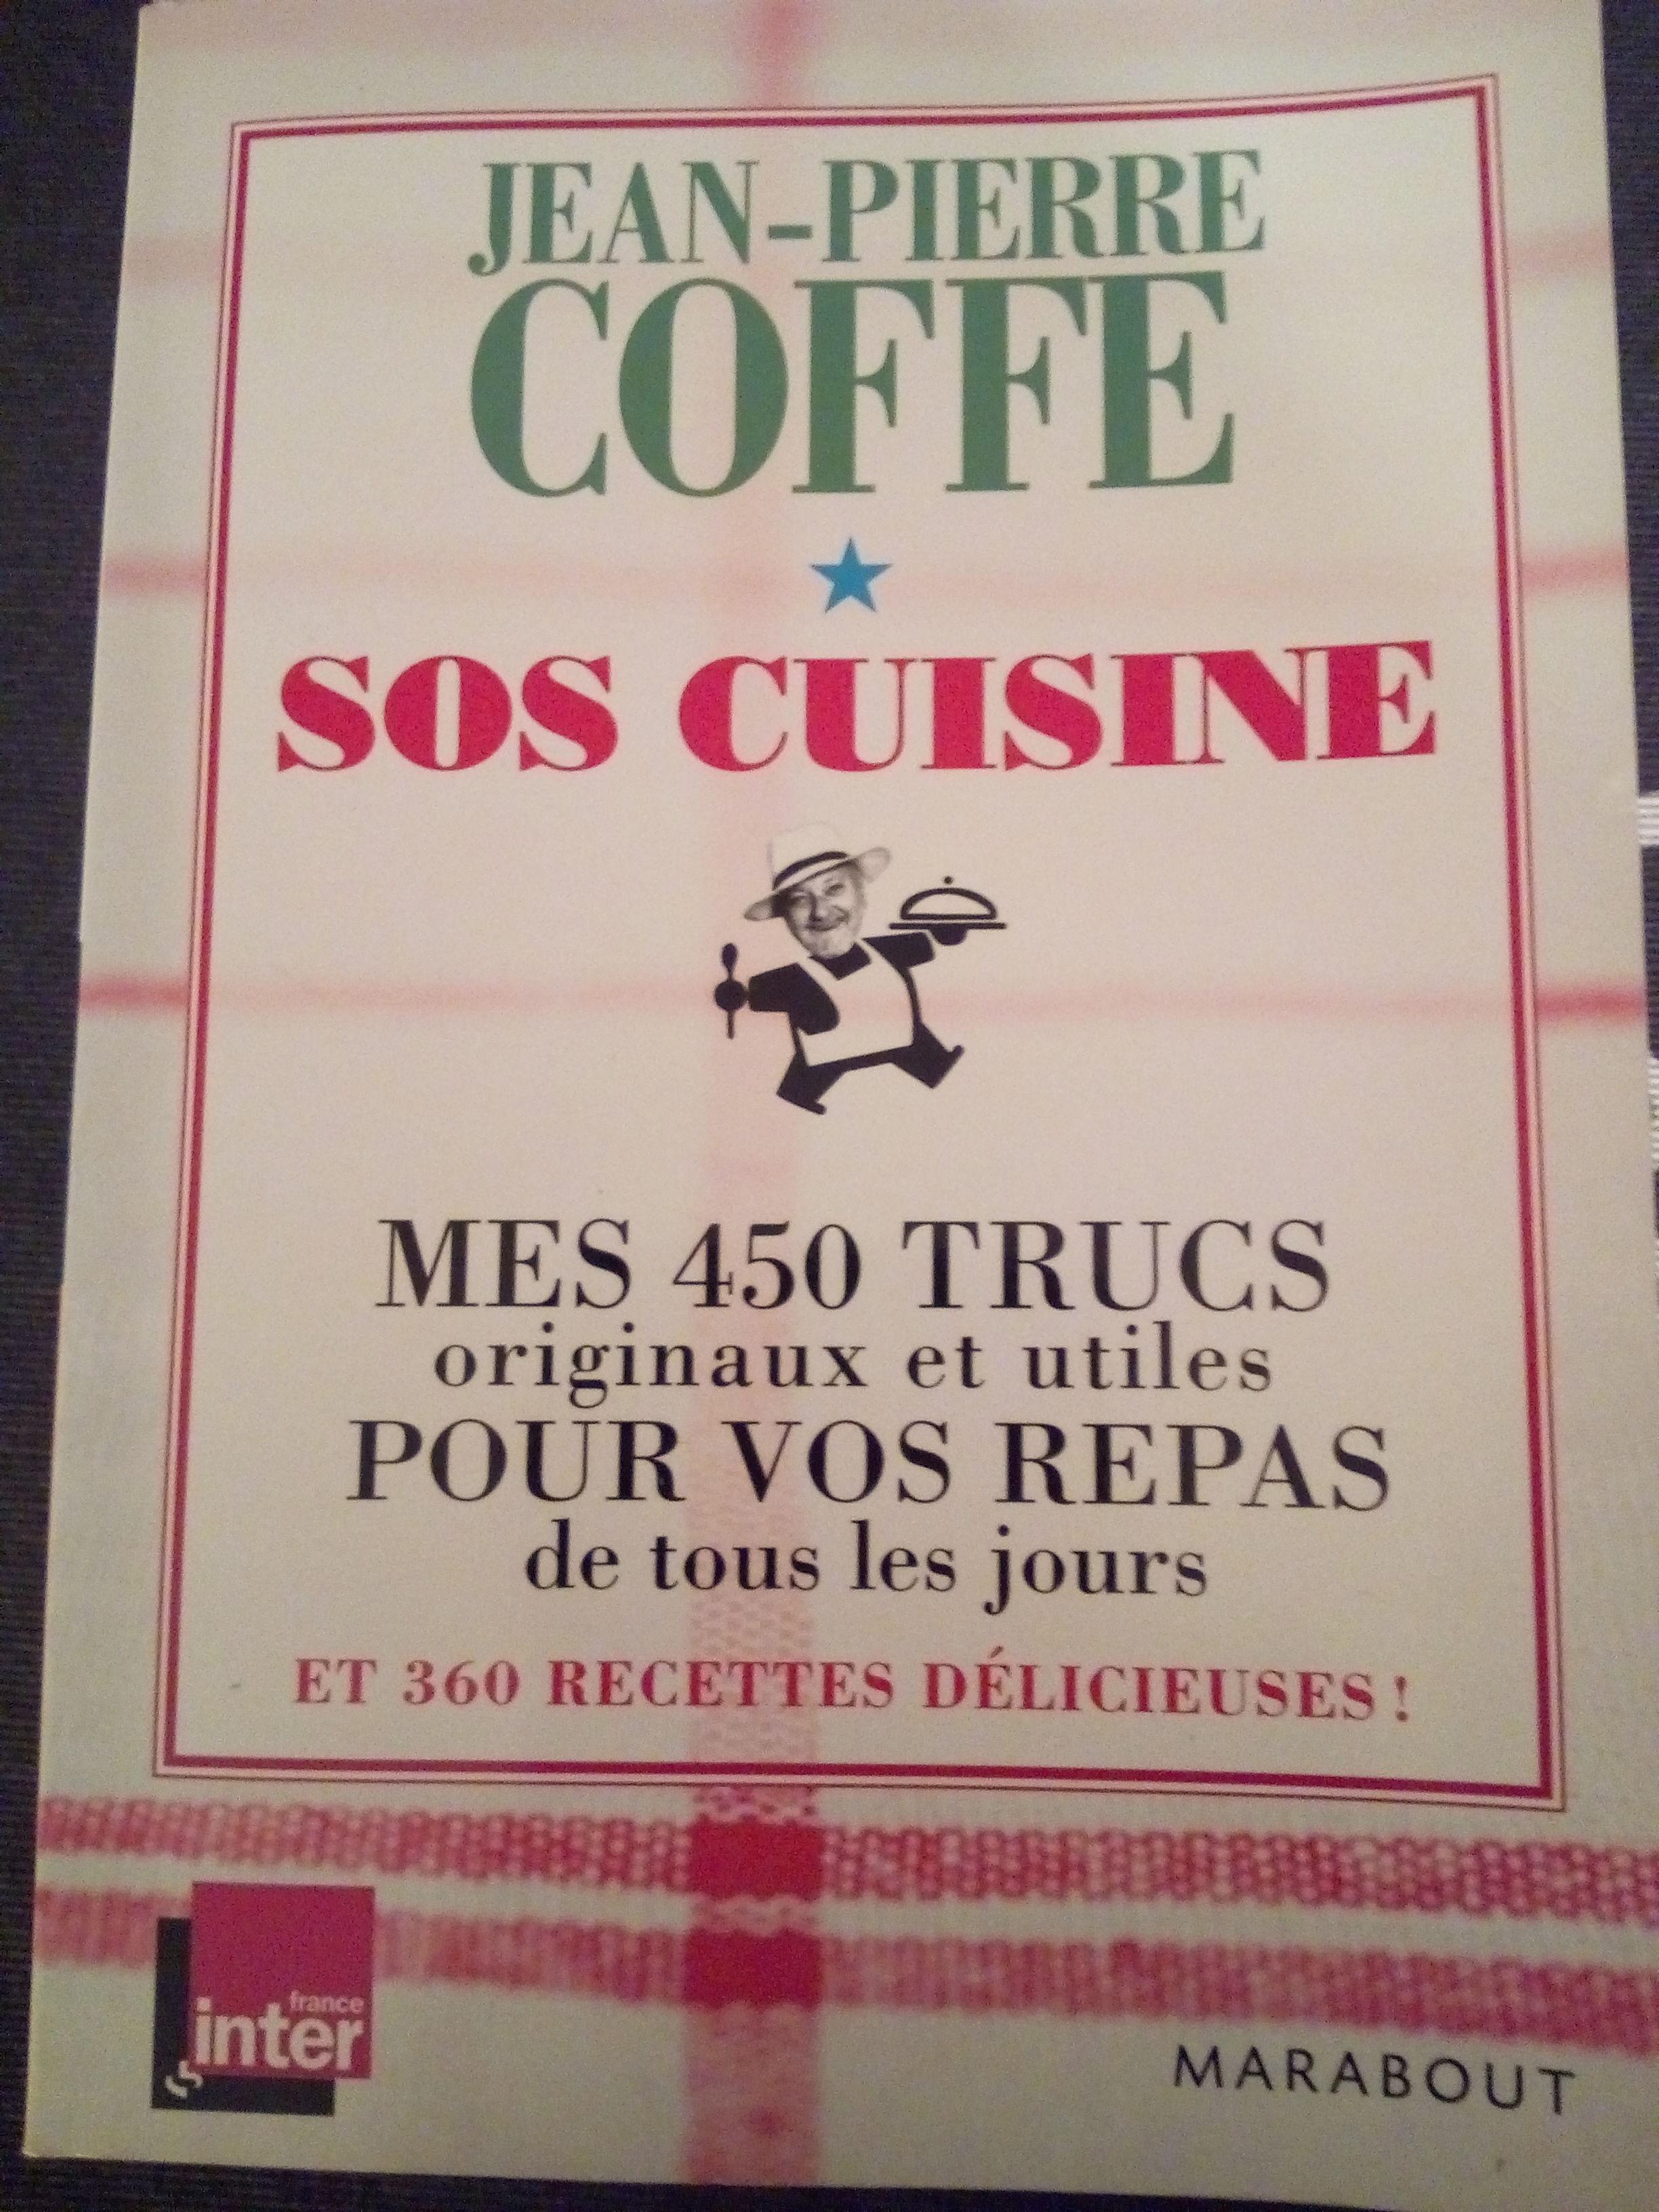 Jean Pierre Coffe - SOS Cuisine  4 Savigny-sur-Orge (91)